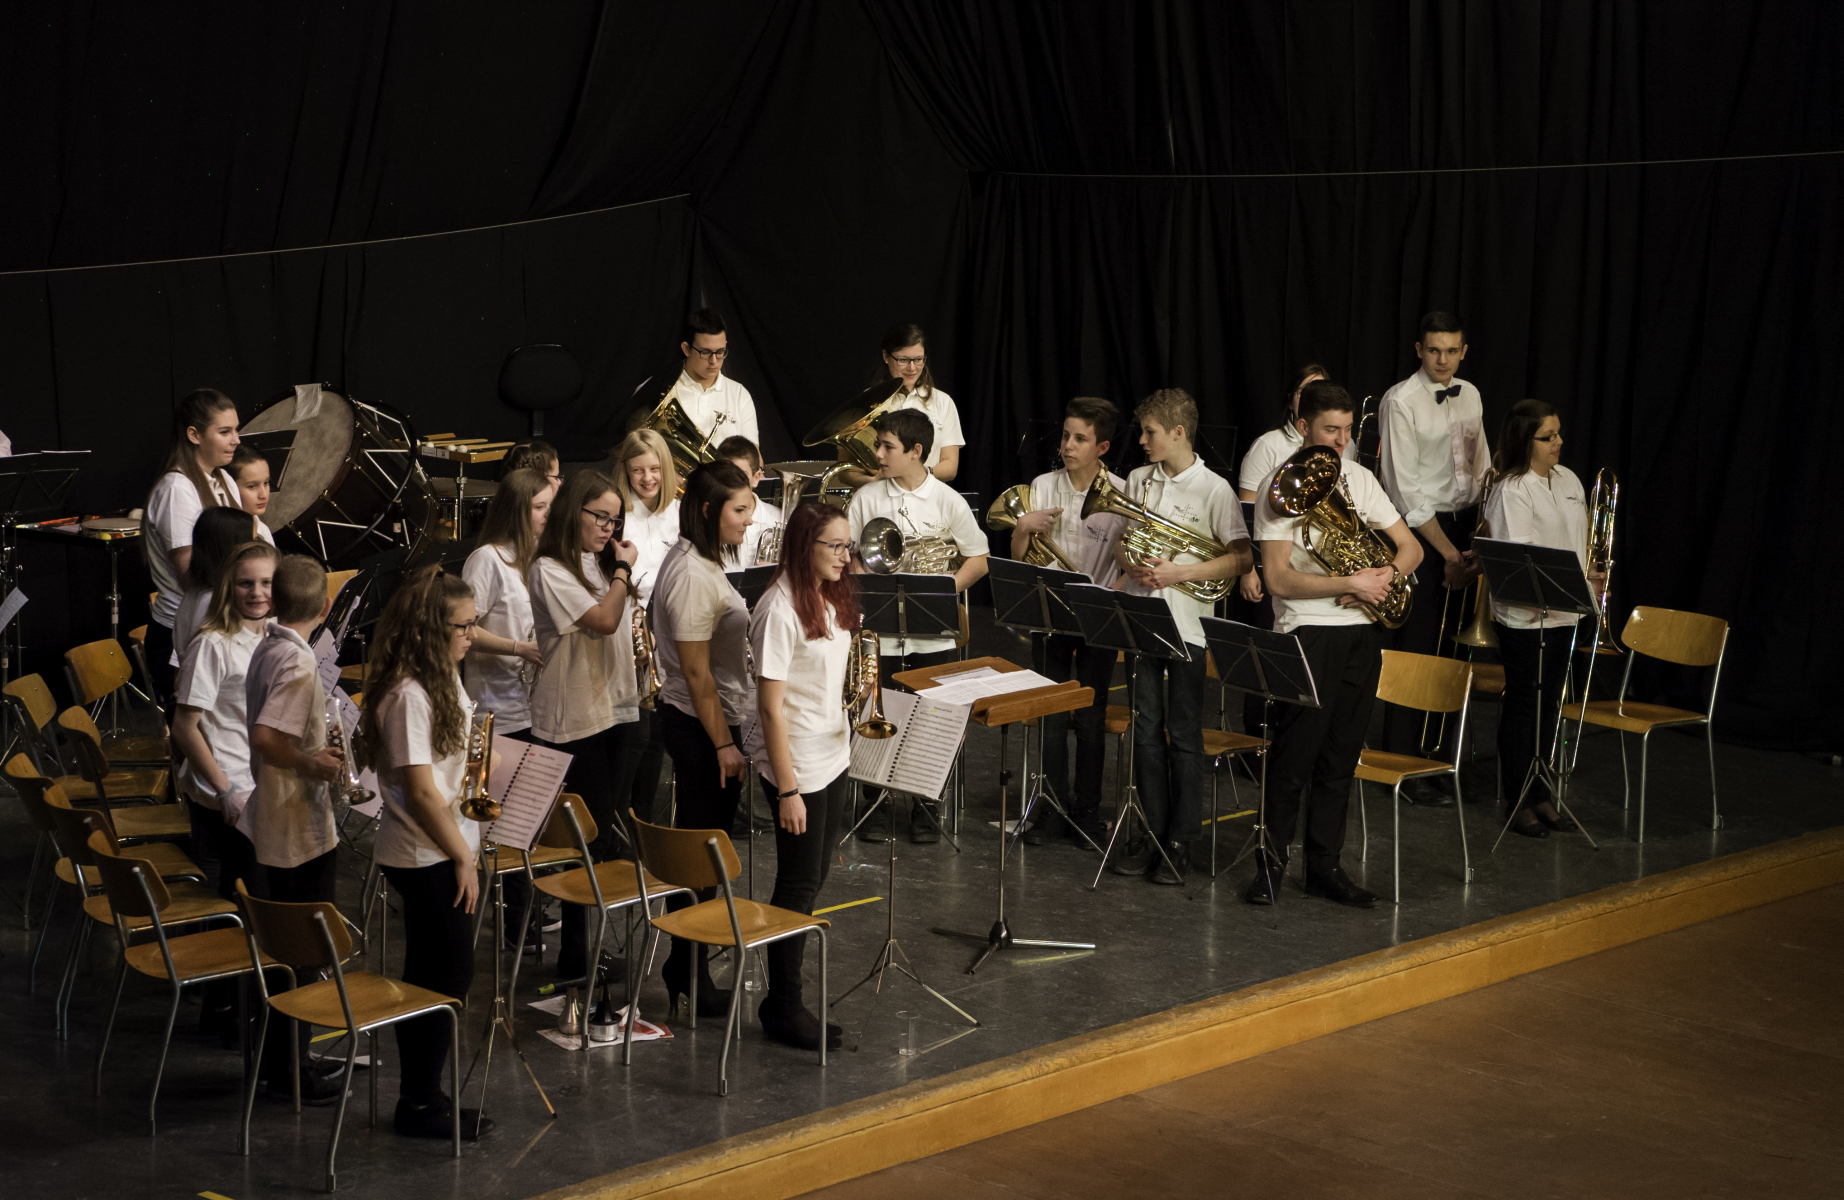 170211_concert_annuel17-028